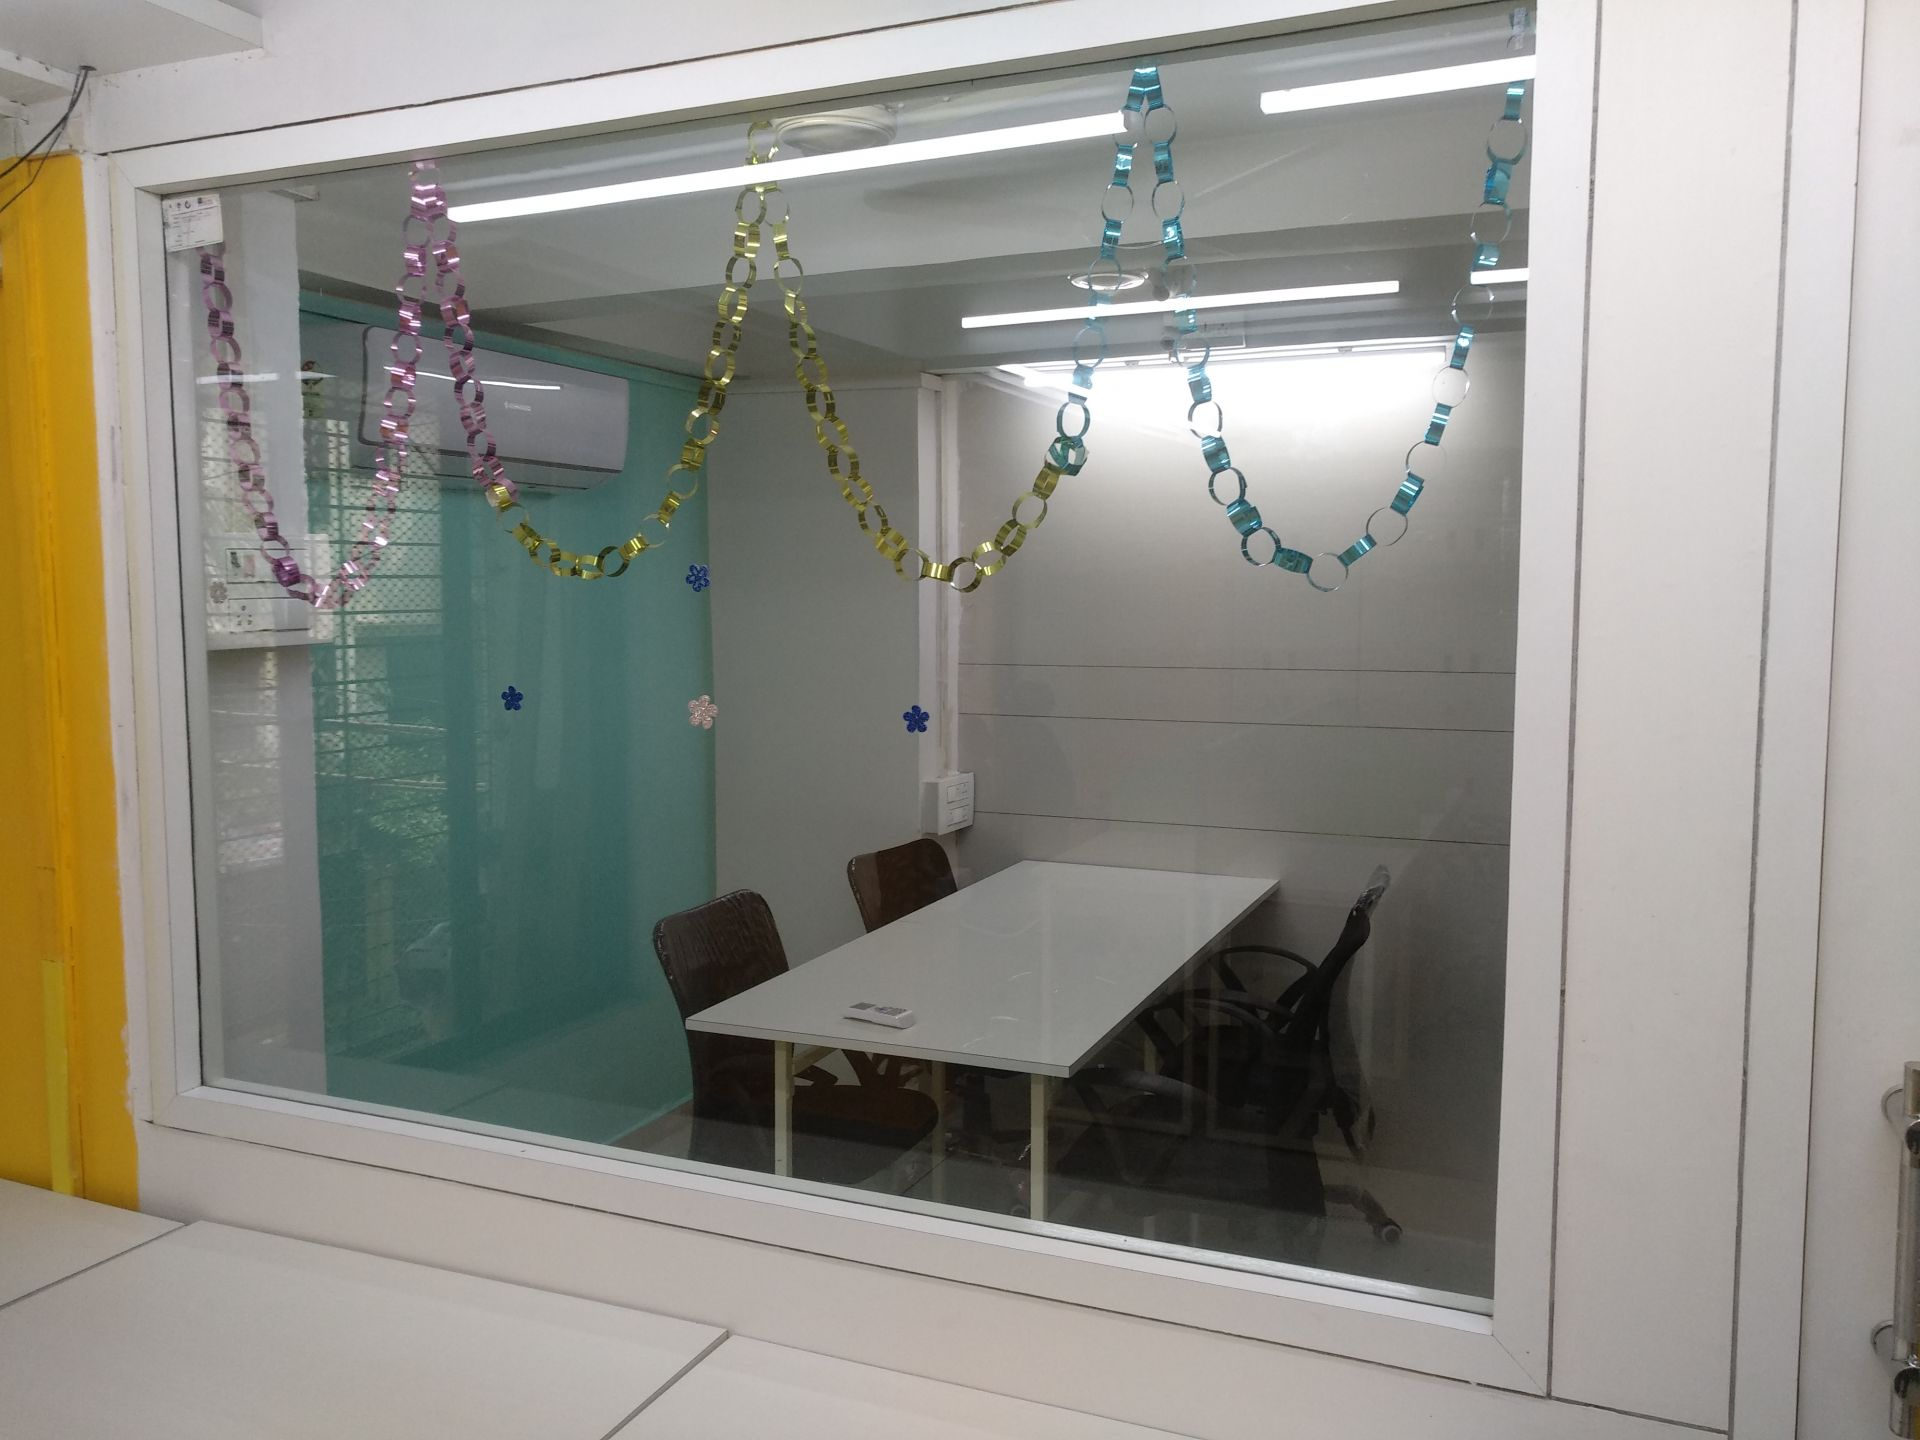 Samruddhi Coworking Space, Thane